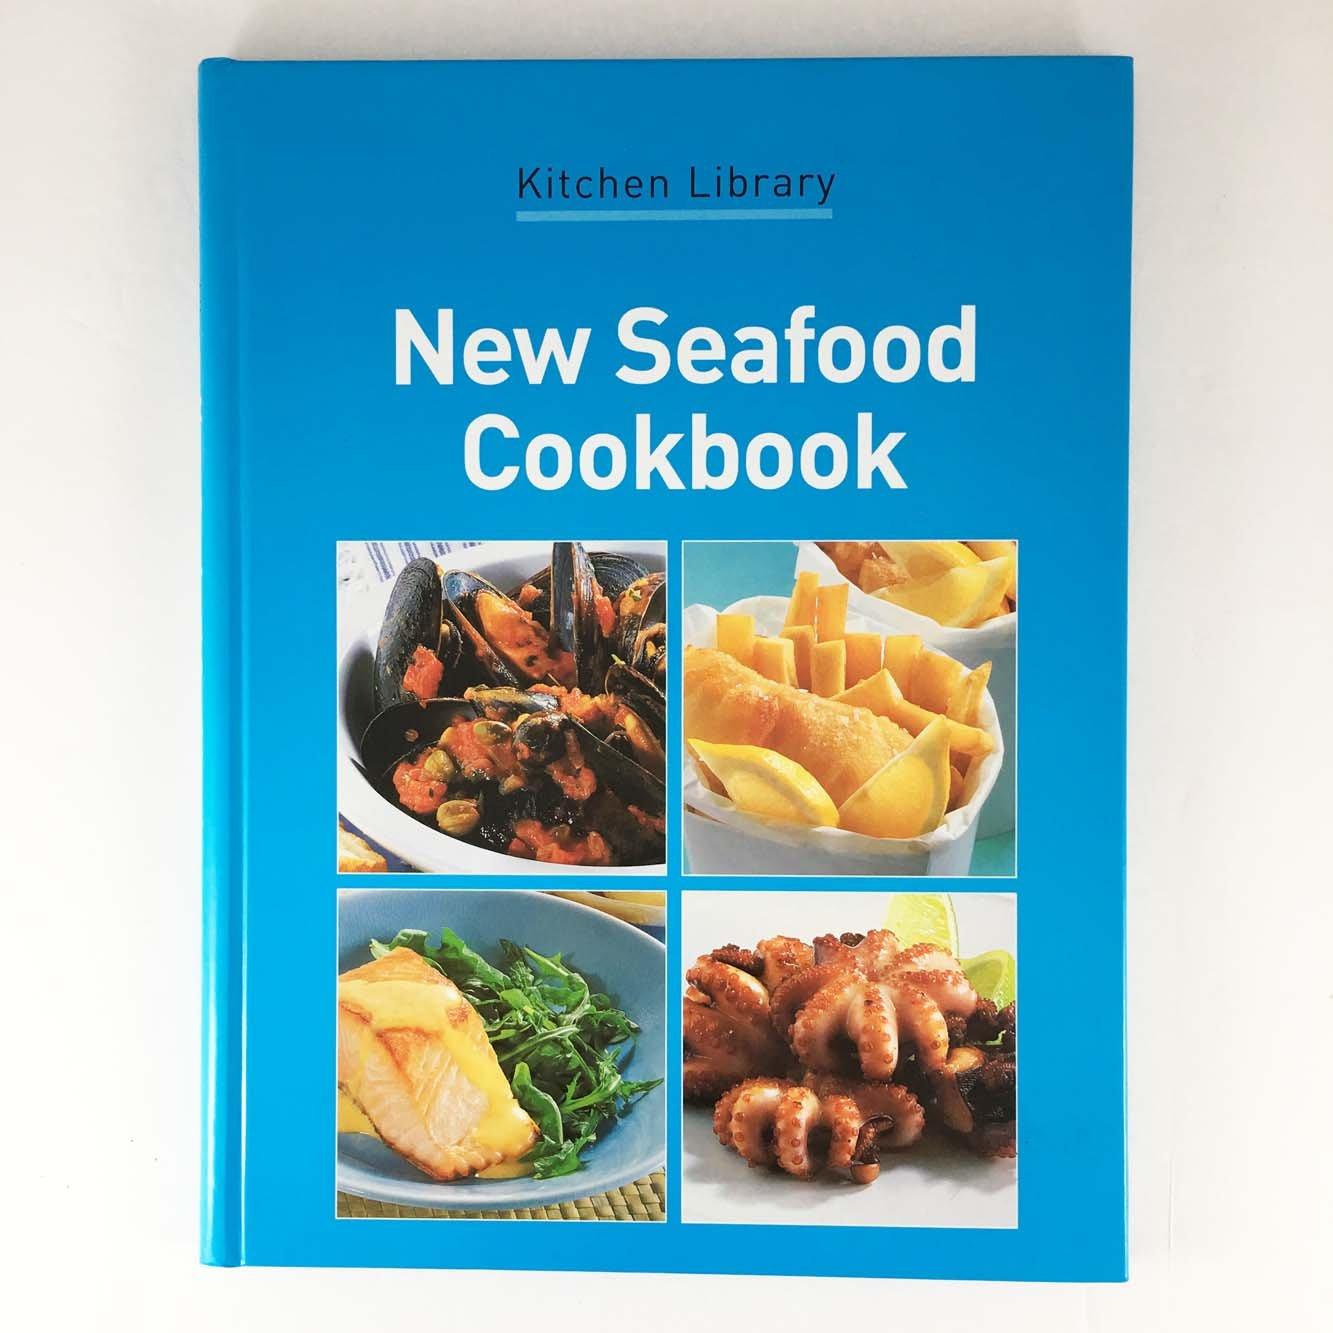 New Seafood Cookbook (Kitchen Library): Wendy Stephen, Jane Lawson ...